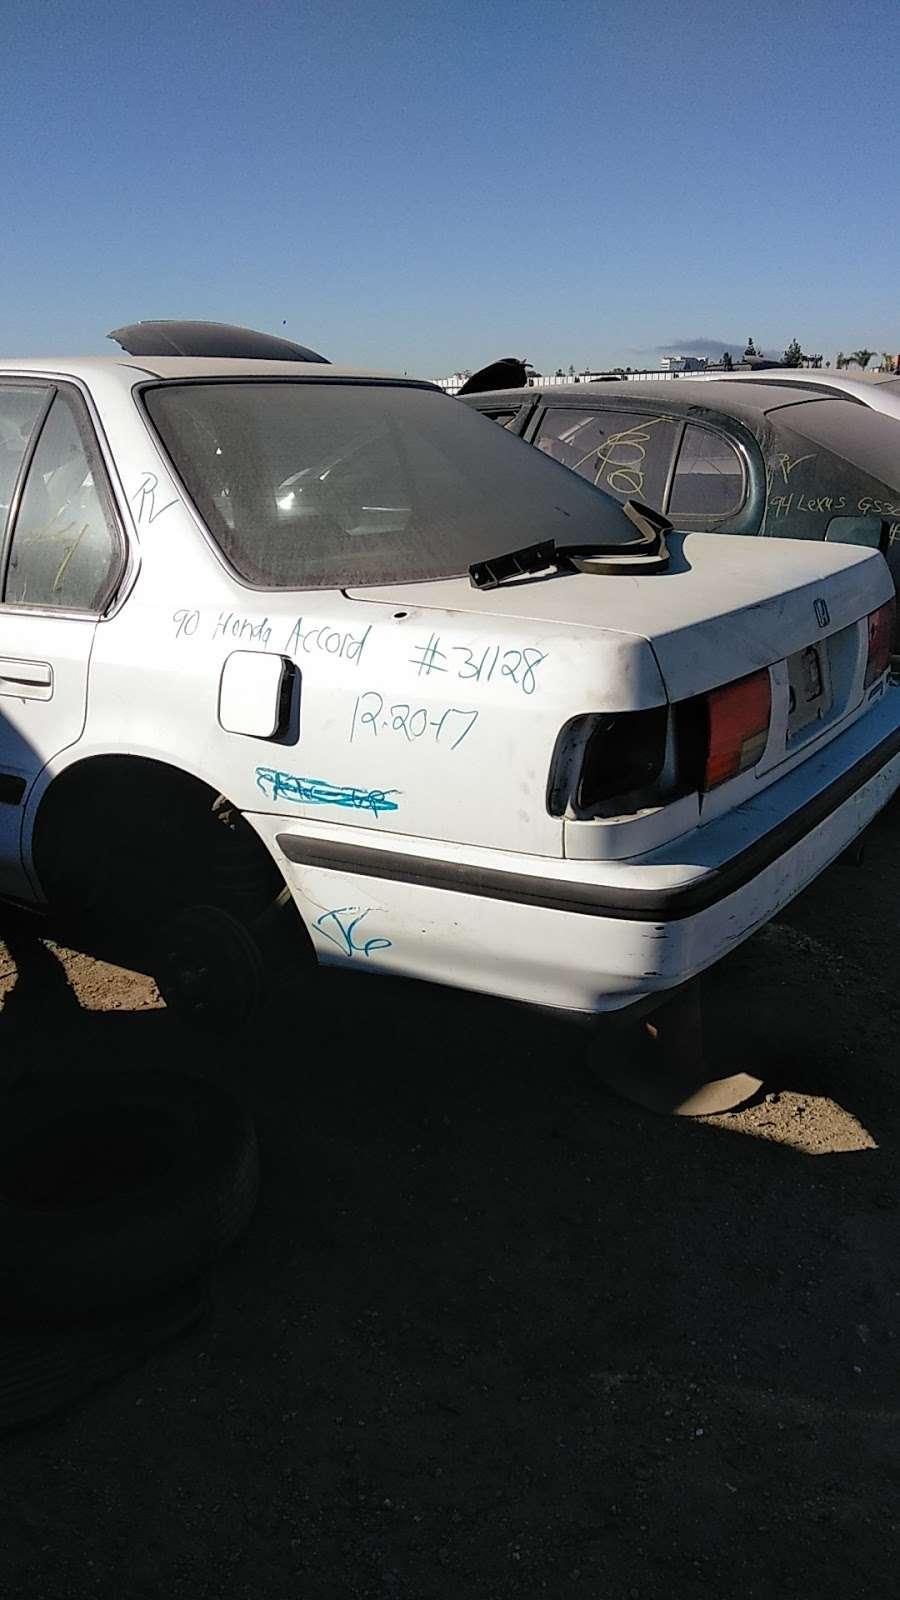 LKQ Pick Your Part - San Bernardino - car repair  | Photo 8 of 10 | Address: 434 6th St, San Bernardino, CA 92410, USA | Phone: (800) 962-2277